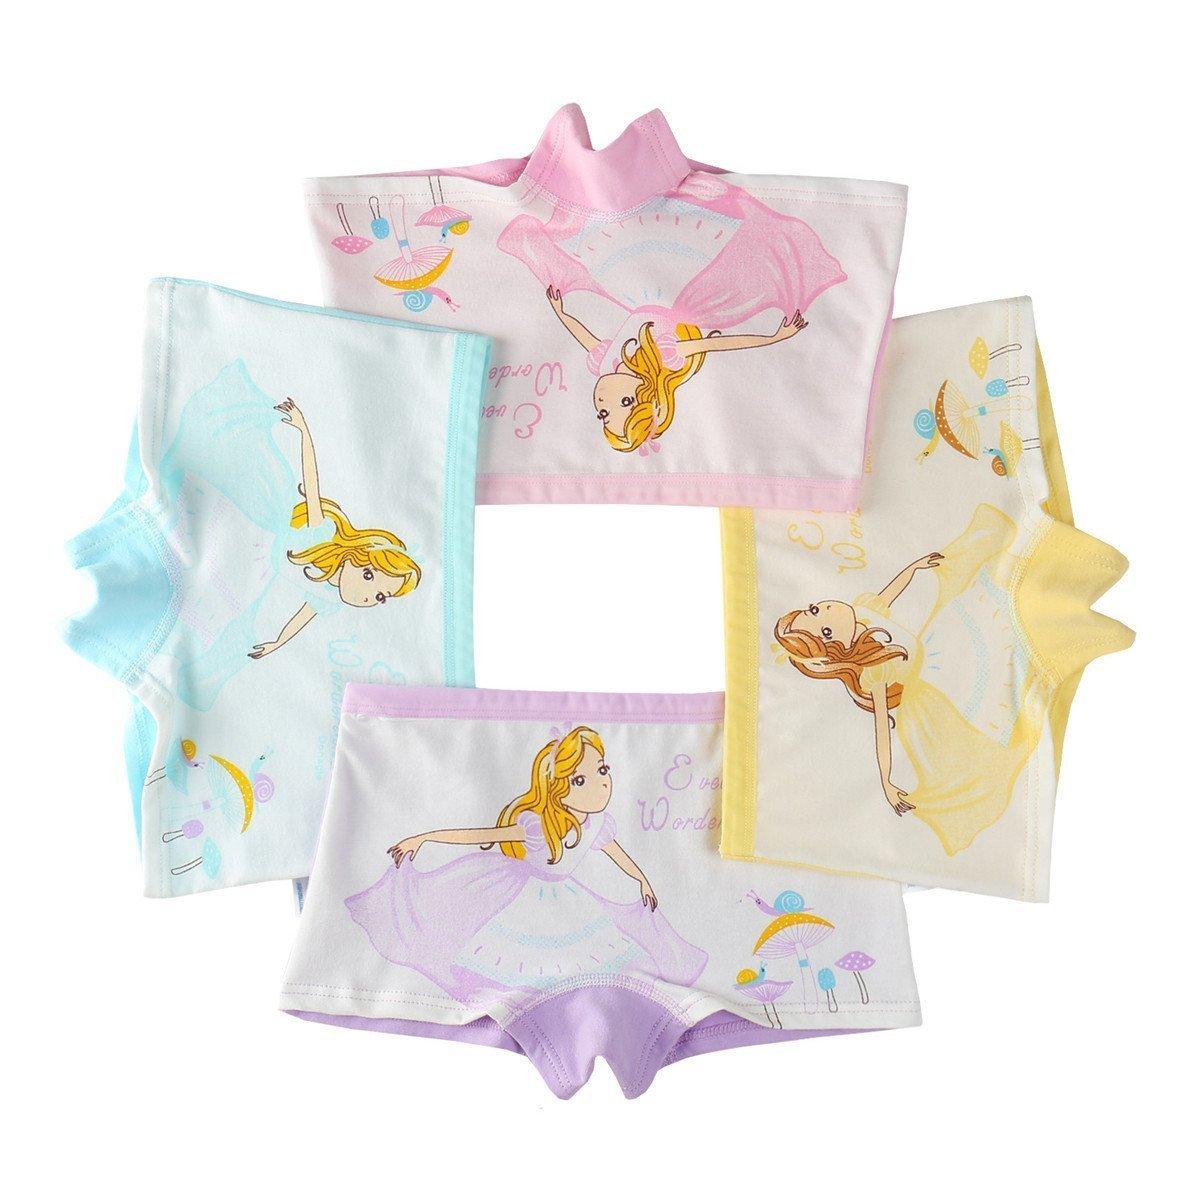 Maylife Little Girls Kids Baby Toddler 4Pcs Mushroom Princess Soft Cotton Boyshort Hipster Panties Kids Underwear